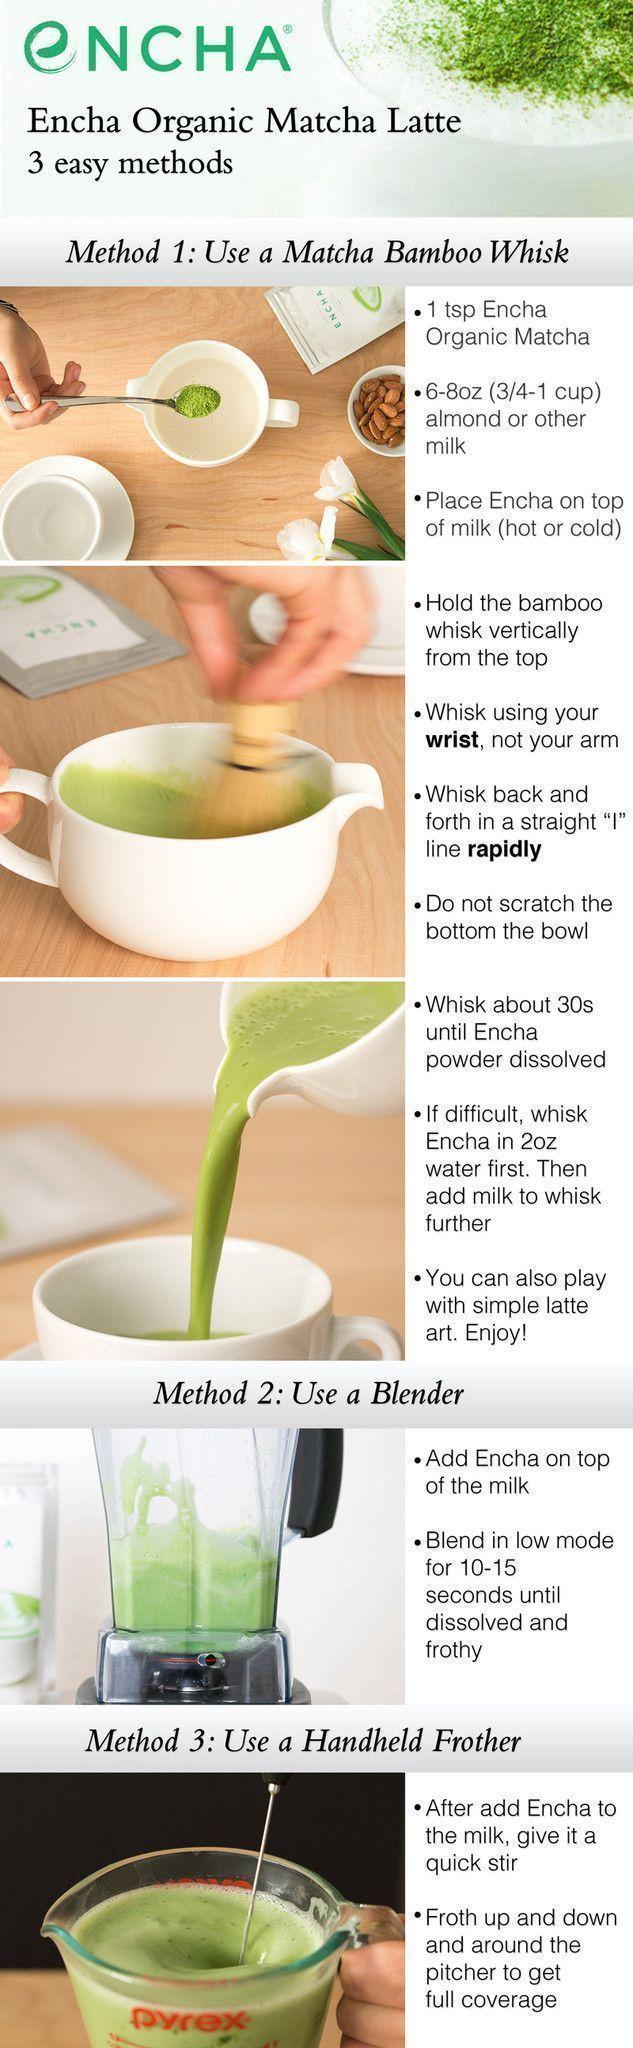 3 Methods of Making Matcha Latte DIY instruction using a bamboo whisk, blender or handheld milk frother with Encha Organic #matcha Find more stuff: www.victoriasbestmatchatea.com #AsianFoodRecipes http://juicerblendercenter.com/choosing-between-a-masticating-or-a-centrifugal-juicer/